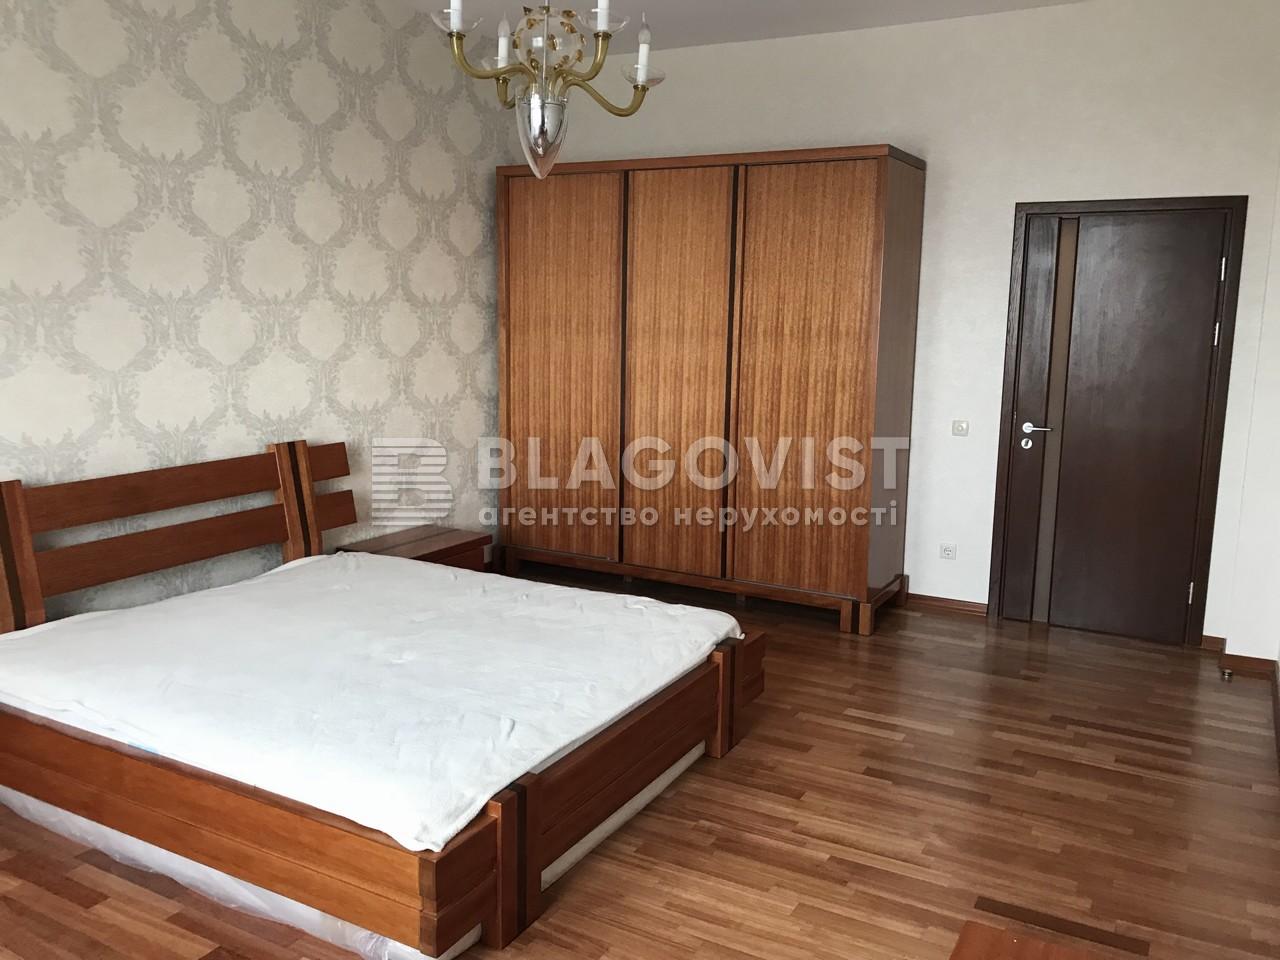 Квартира A-73479, Коновальца Евгения (Щорса), 32а, Киев - Фото 29